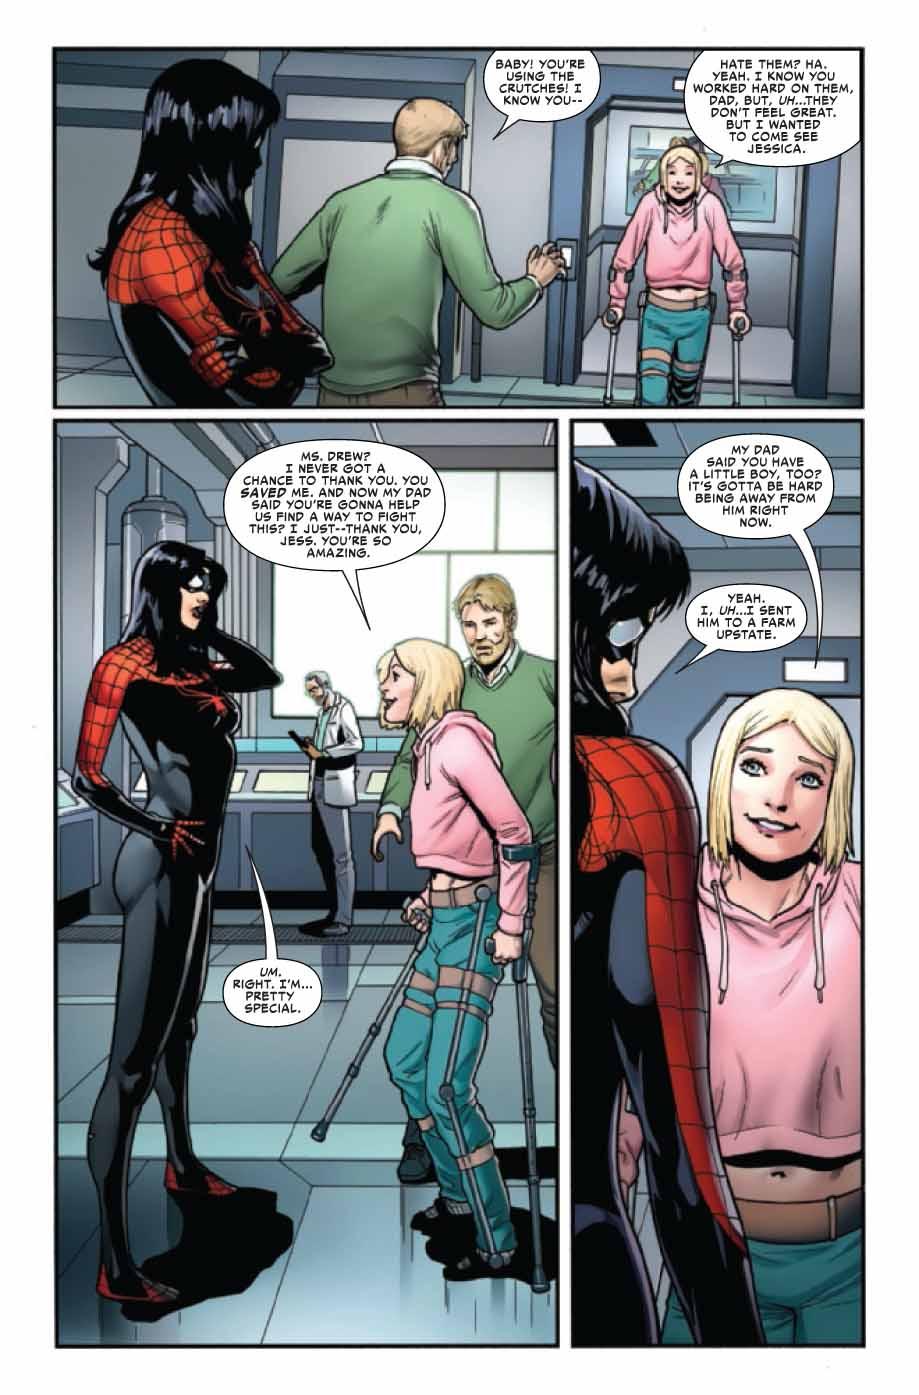 spiderwoman33